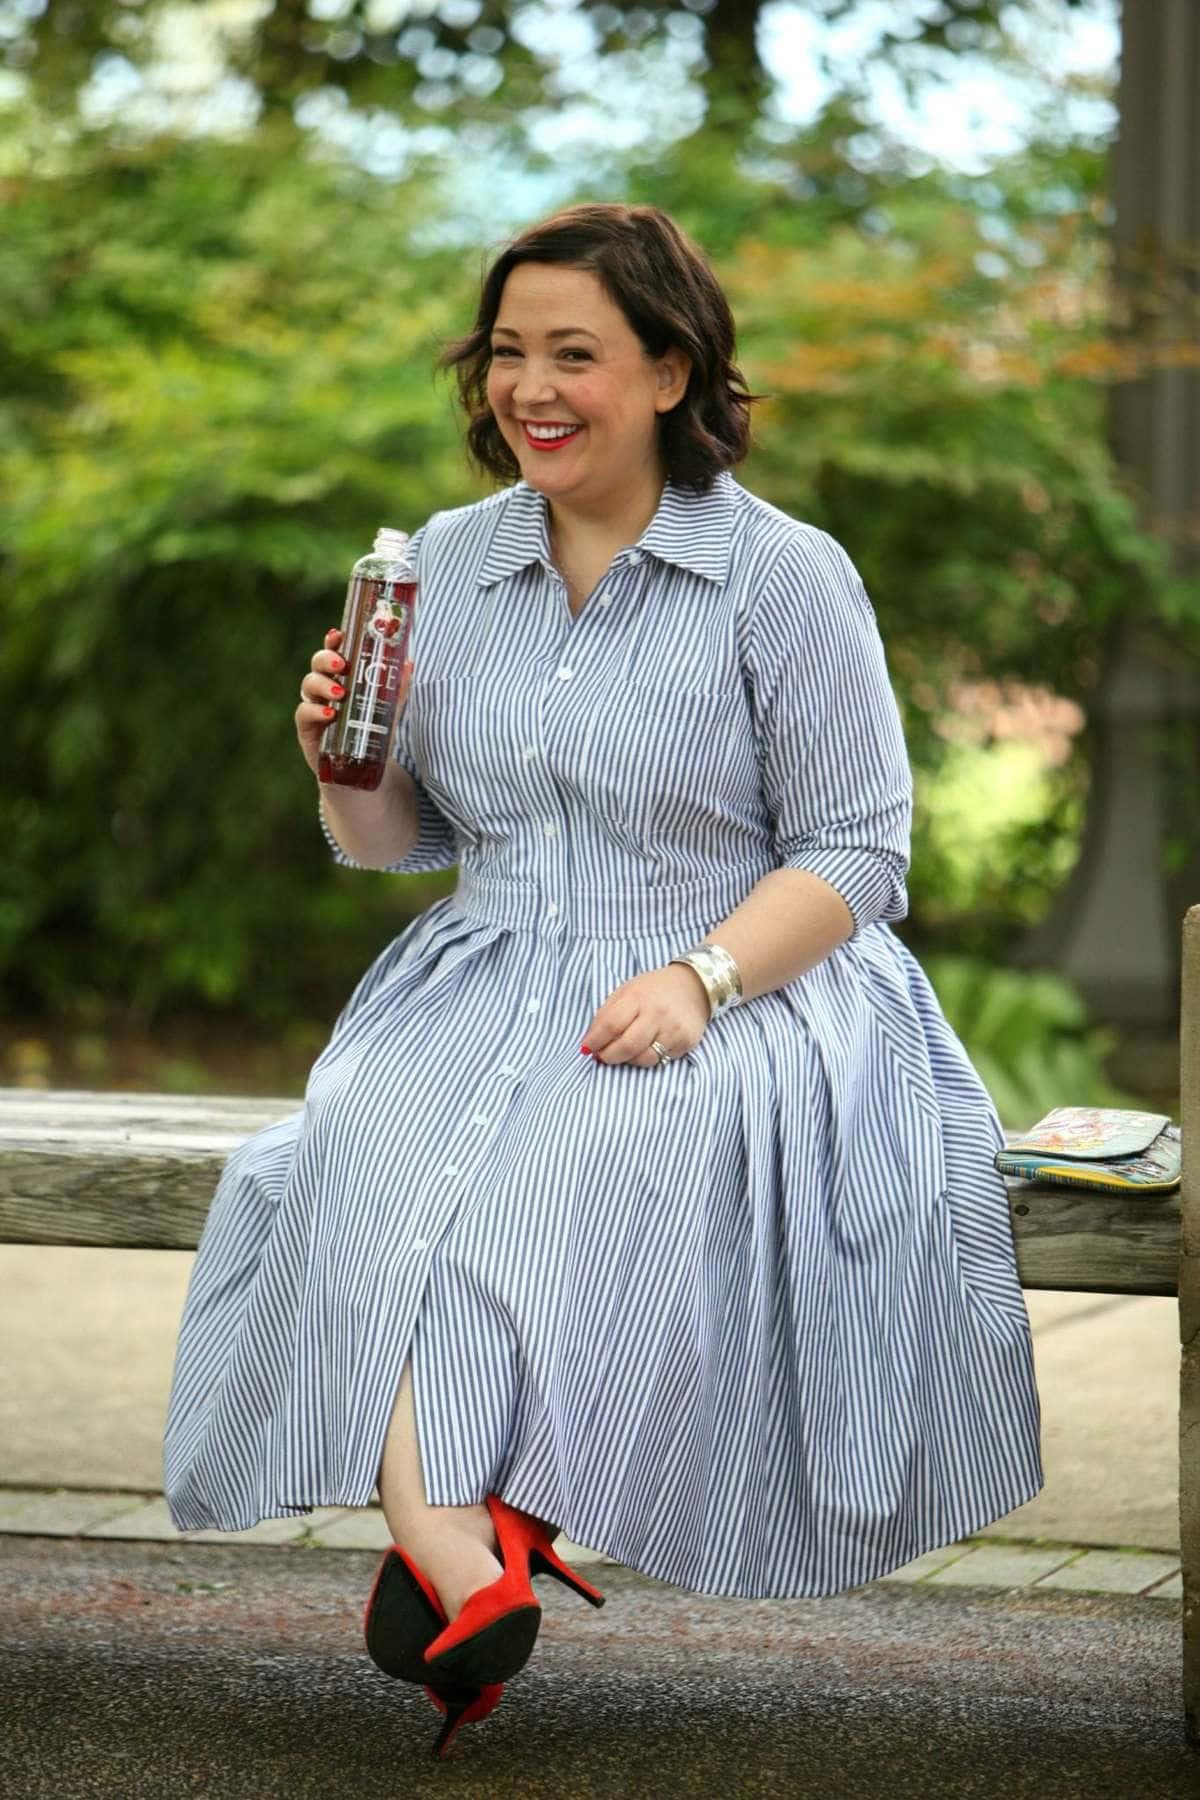 Wardrobe Oxygen: Over 40 fashion blogger wearing an Eliza J shirt dress and Nine West orange pumps